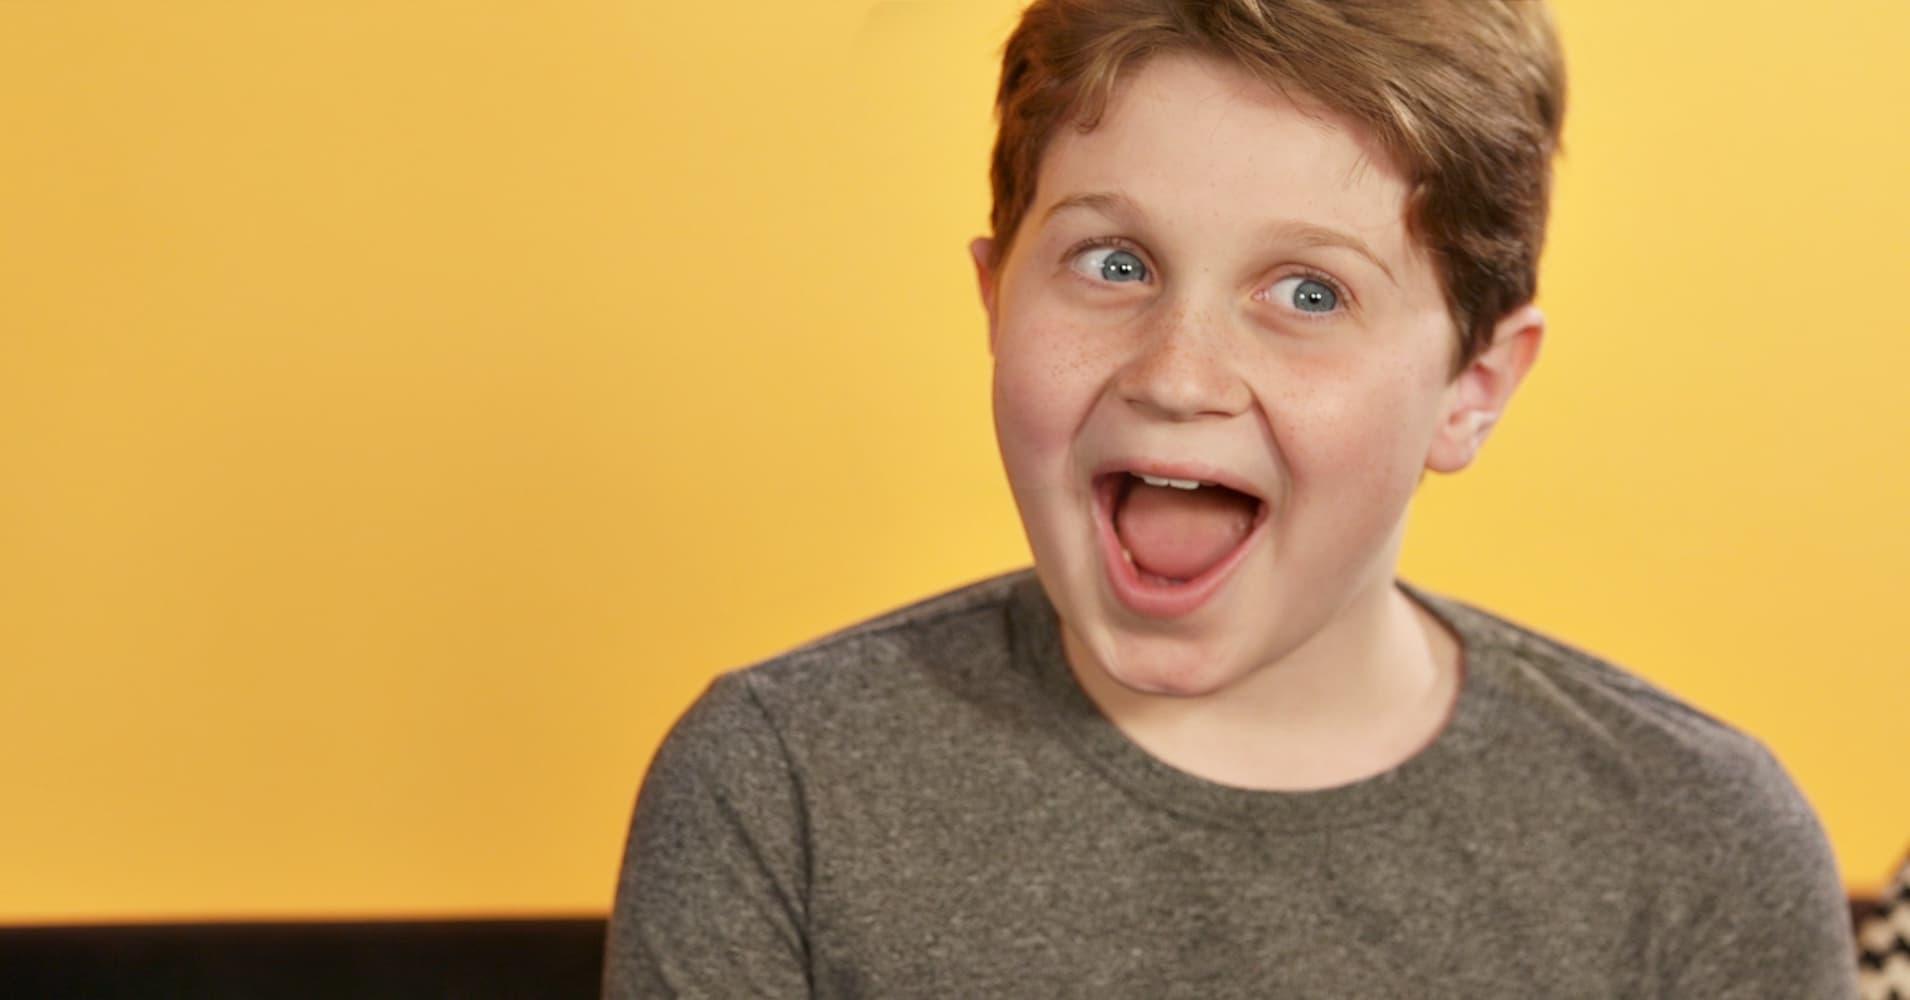 Kids Make Cents: Future Jobs